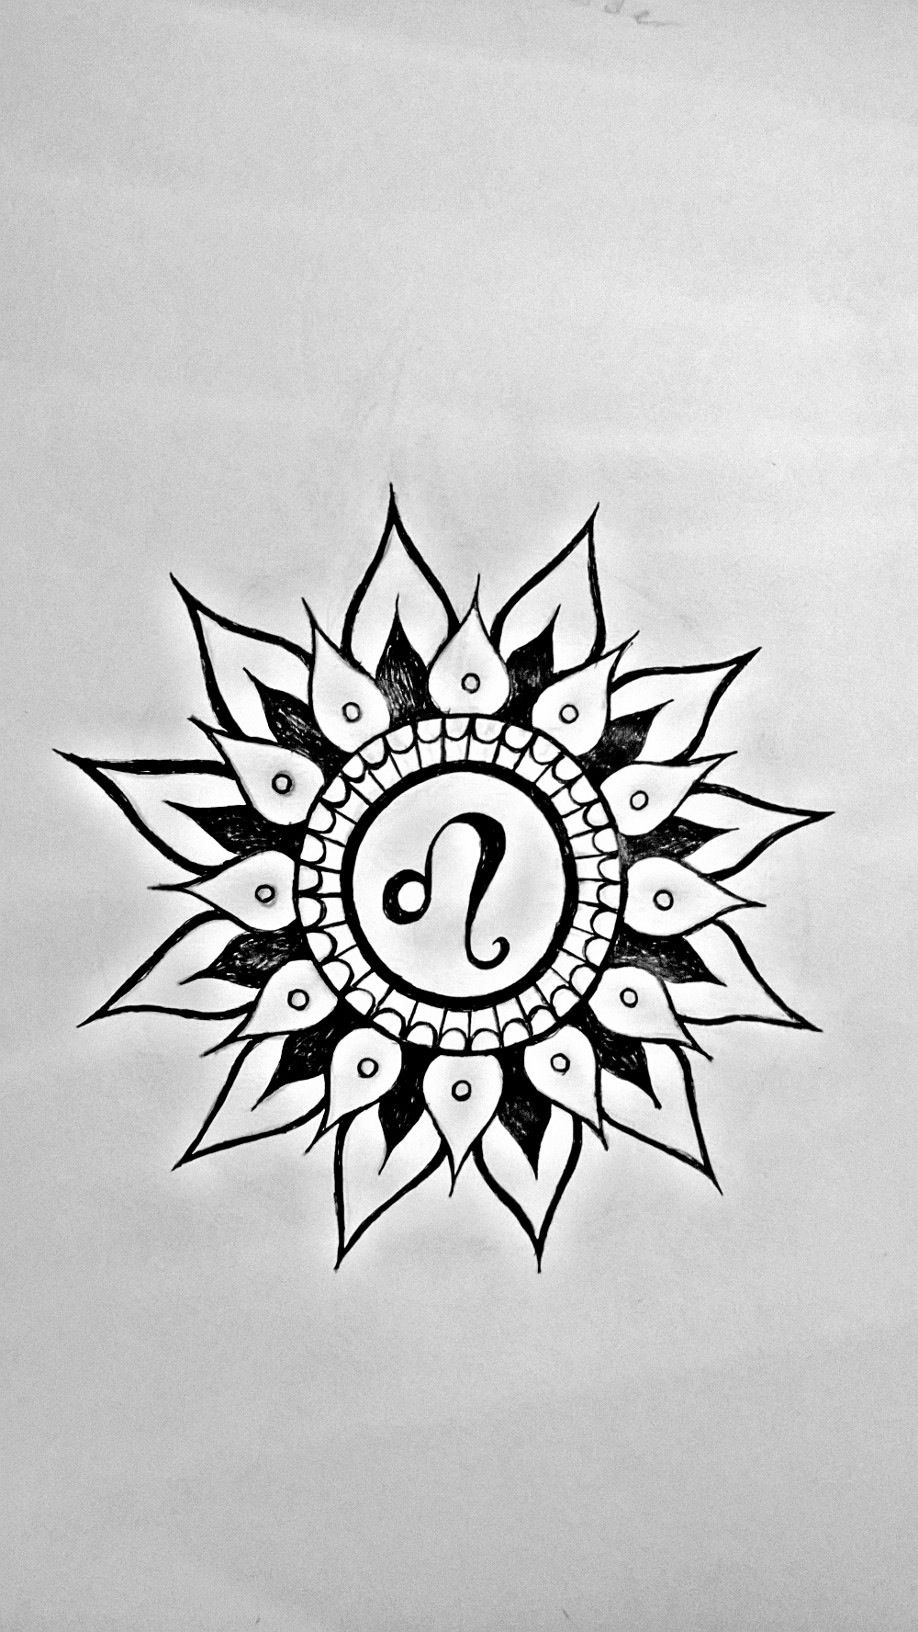 94de1e2d5 Leo Zodiac idea | My Tattoo Designs | Leo tattoos, Zodiac tattoos ...